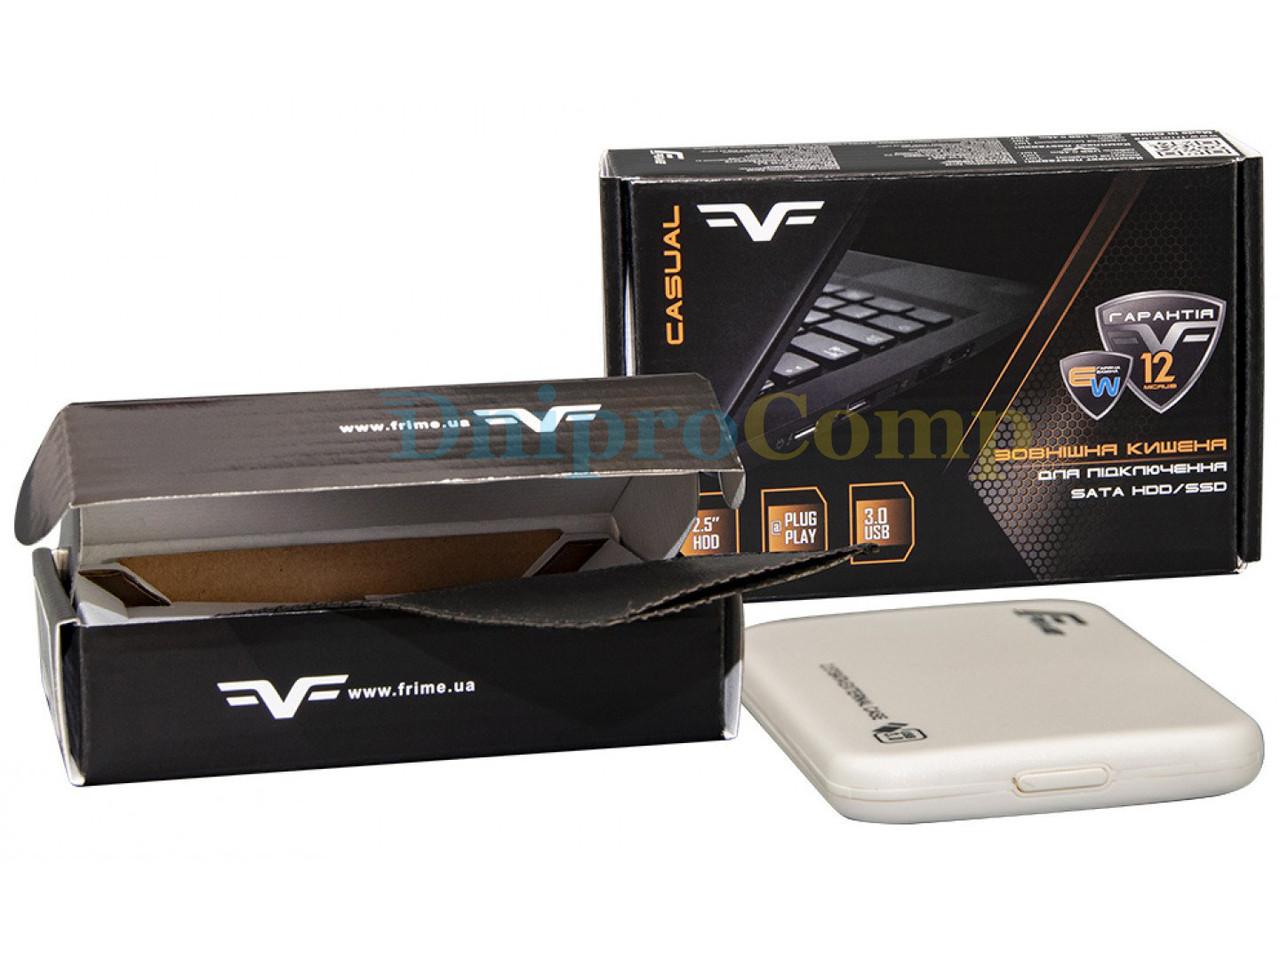 "Зовнішній кишеню Frime SATA HDD/SSD 2.5"", USB 3.0, Plastic, White (FHE71.25U30)"